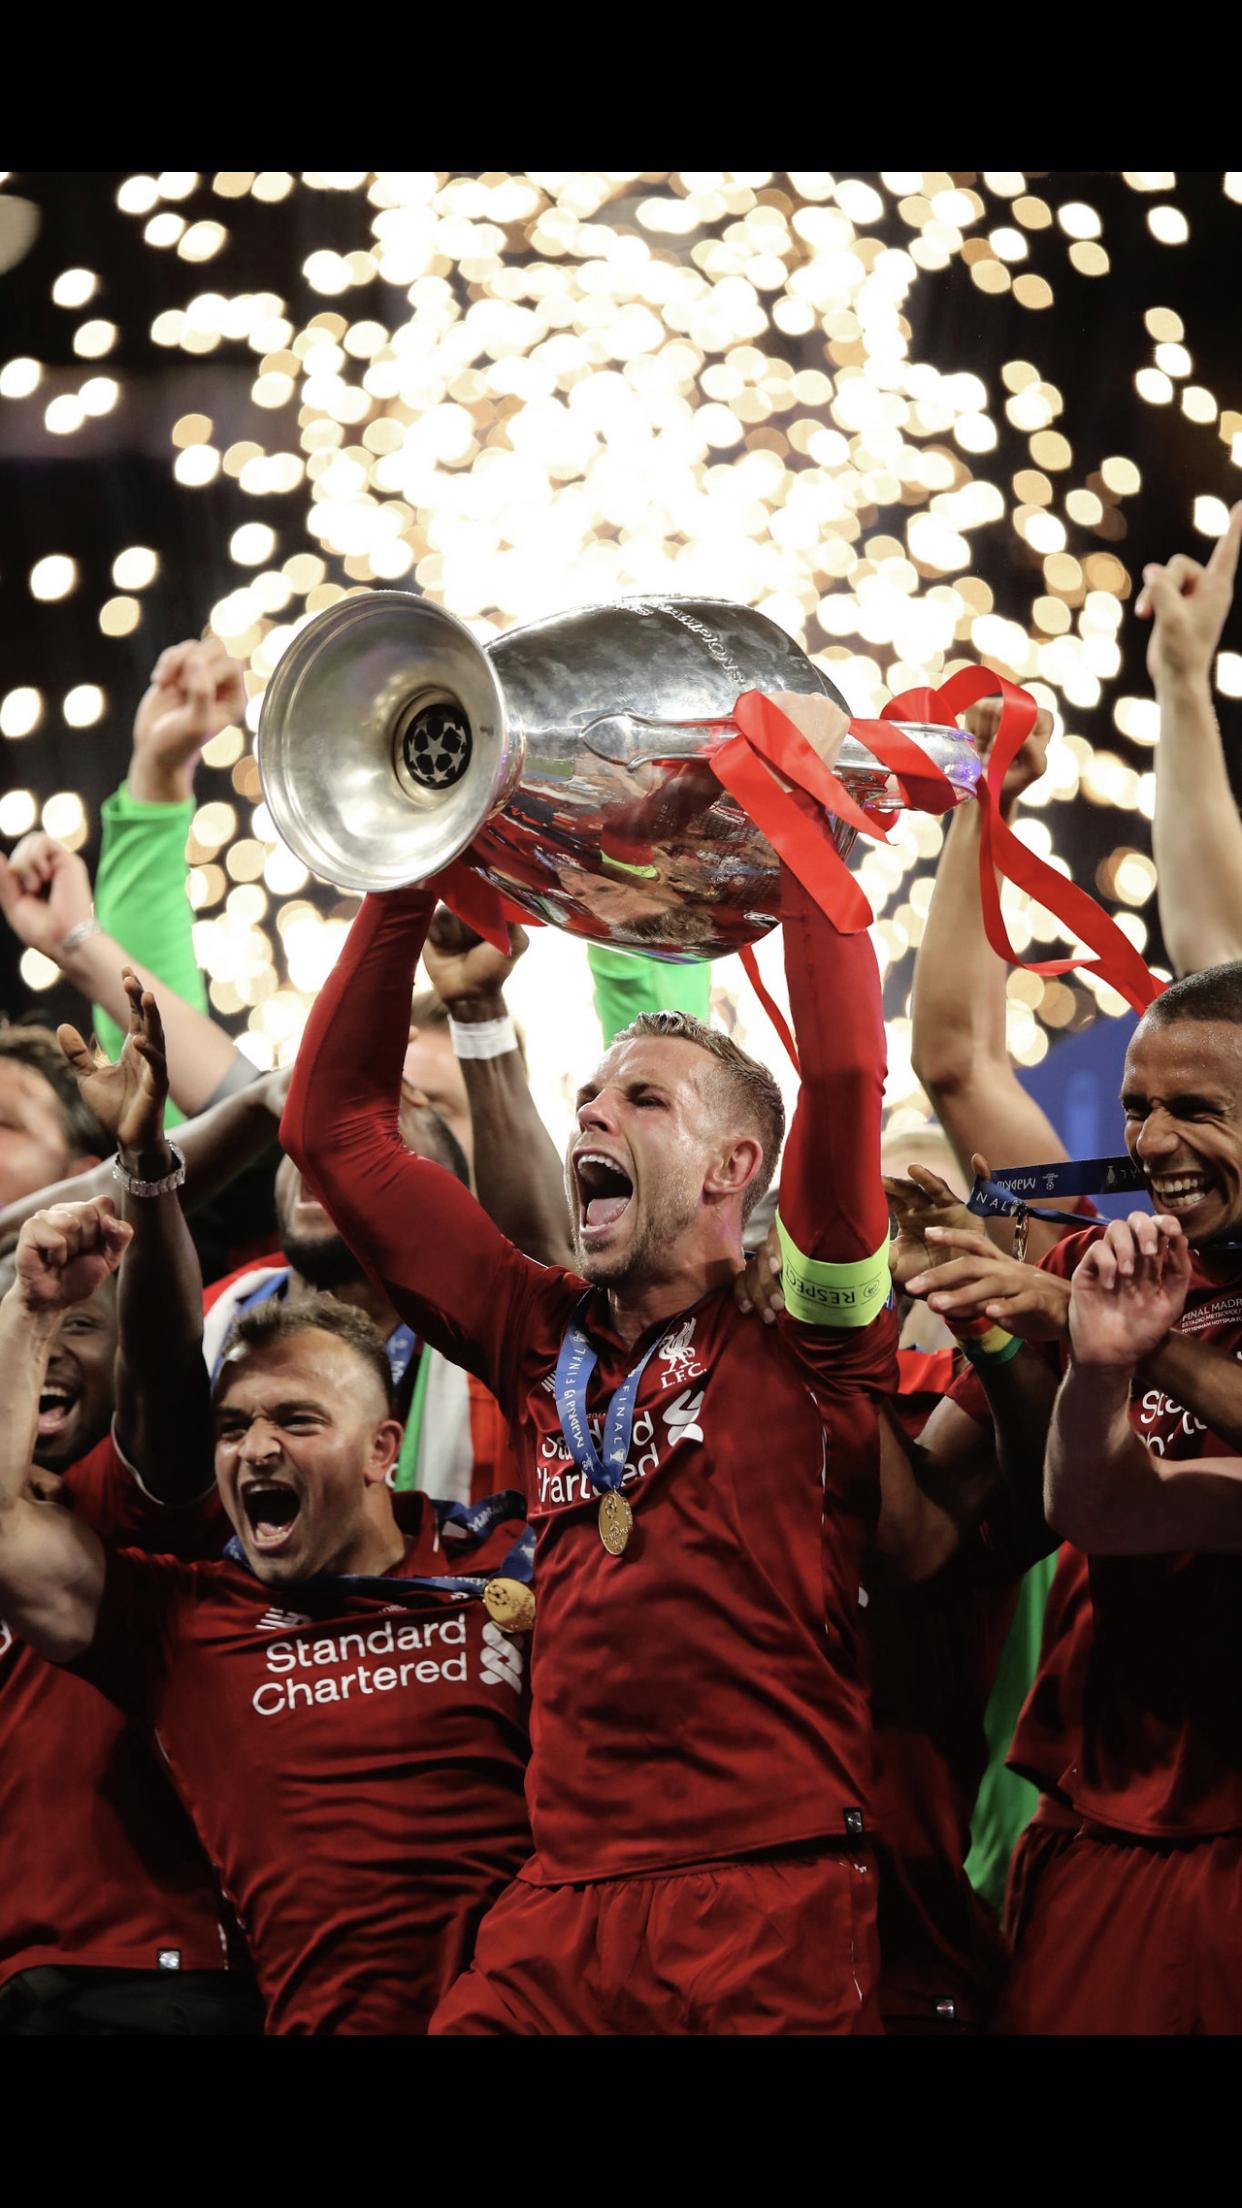 Liverpool Liverpool vs manchester united, Henderson